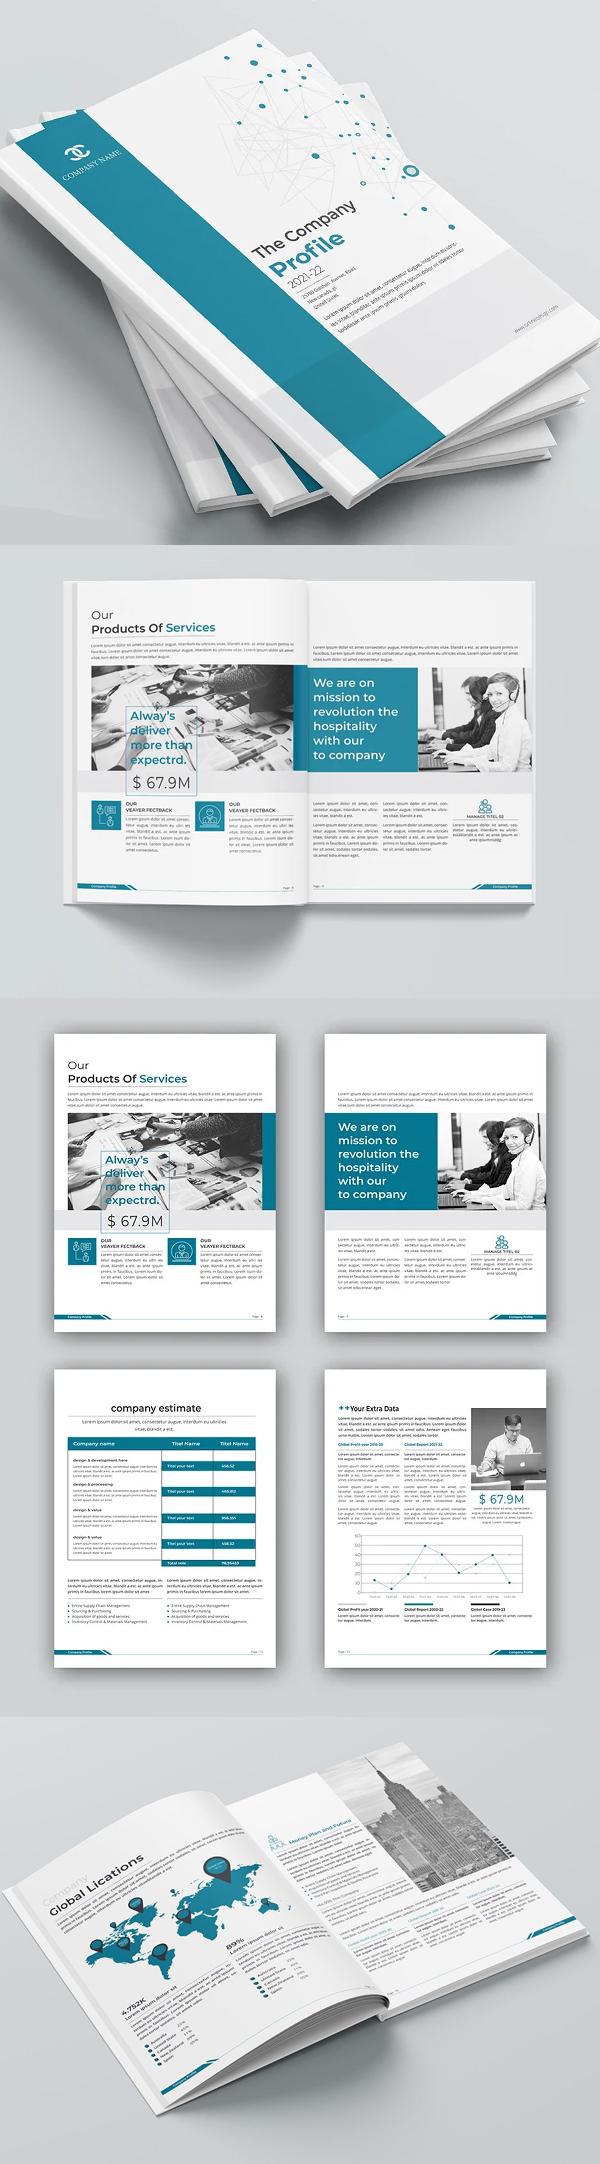 Company Profile 2021 Brochure / Catalog Template